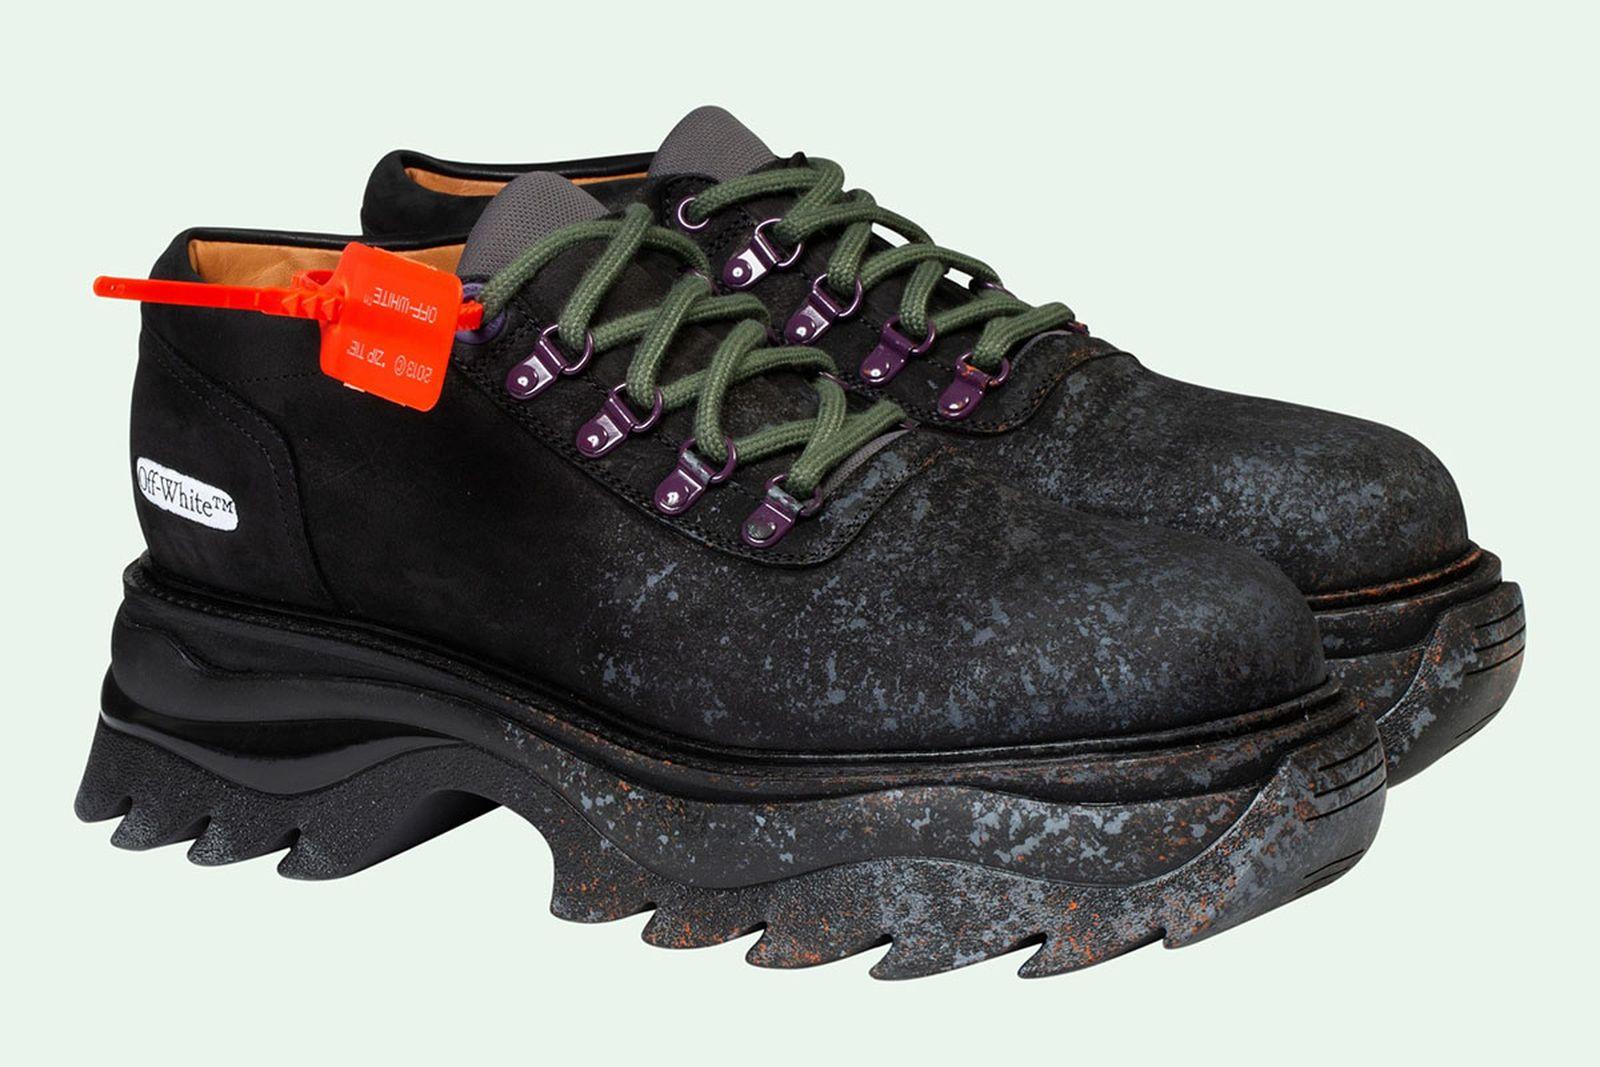 off-white-ridged-sole-sneaker-release-date-price-01